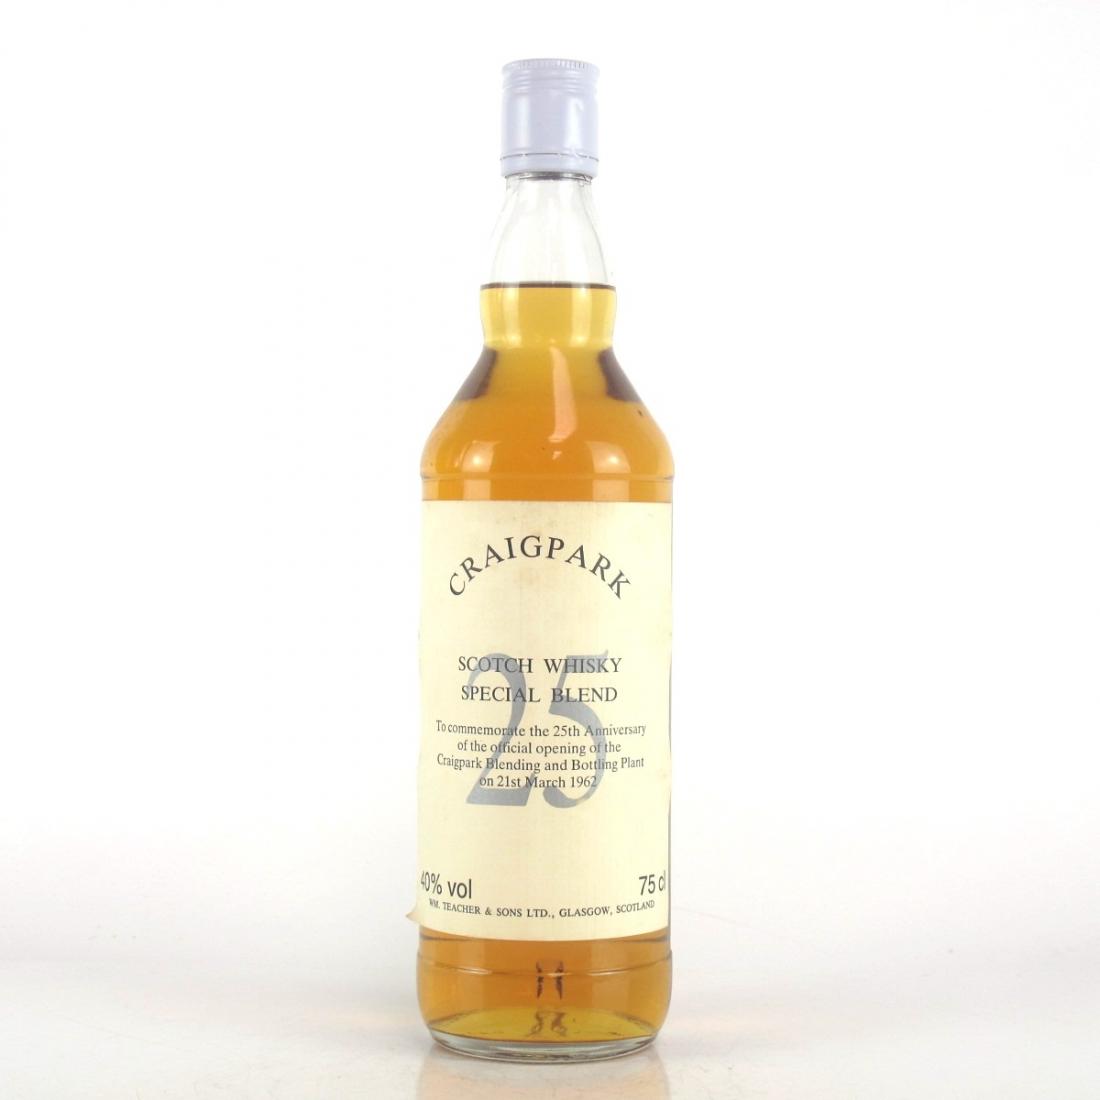 Craigpark Blending and Bottling Plant 25th Anniversary